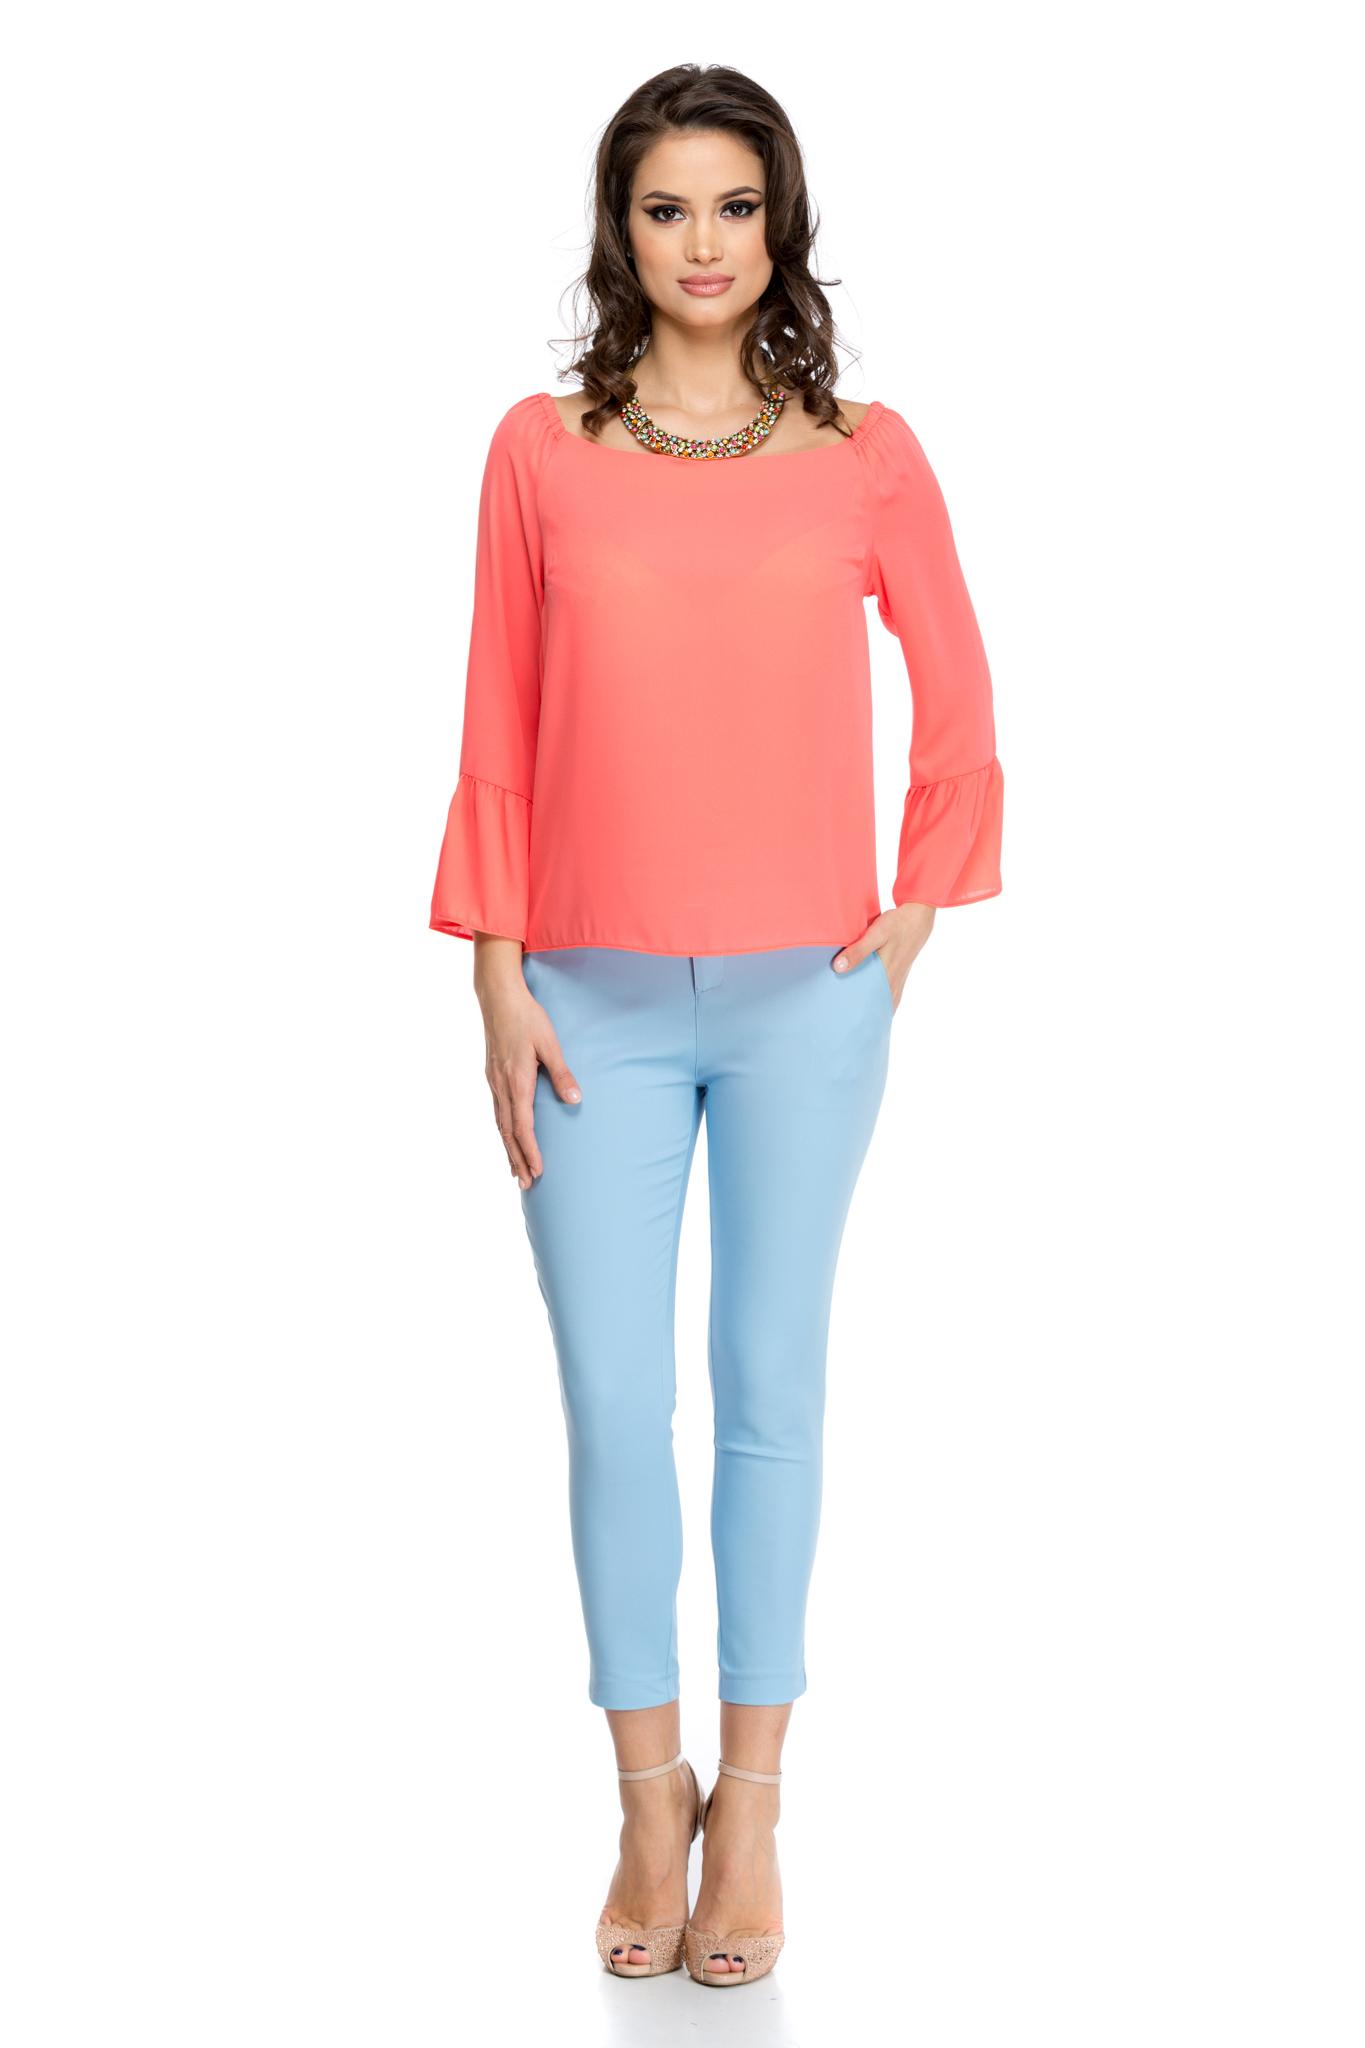 pantaloni novis bleu